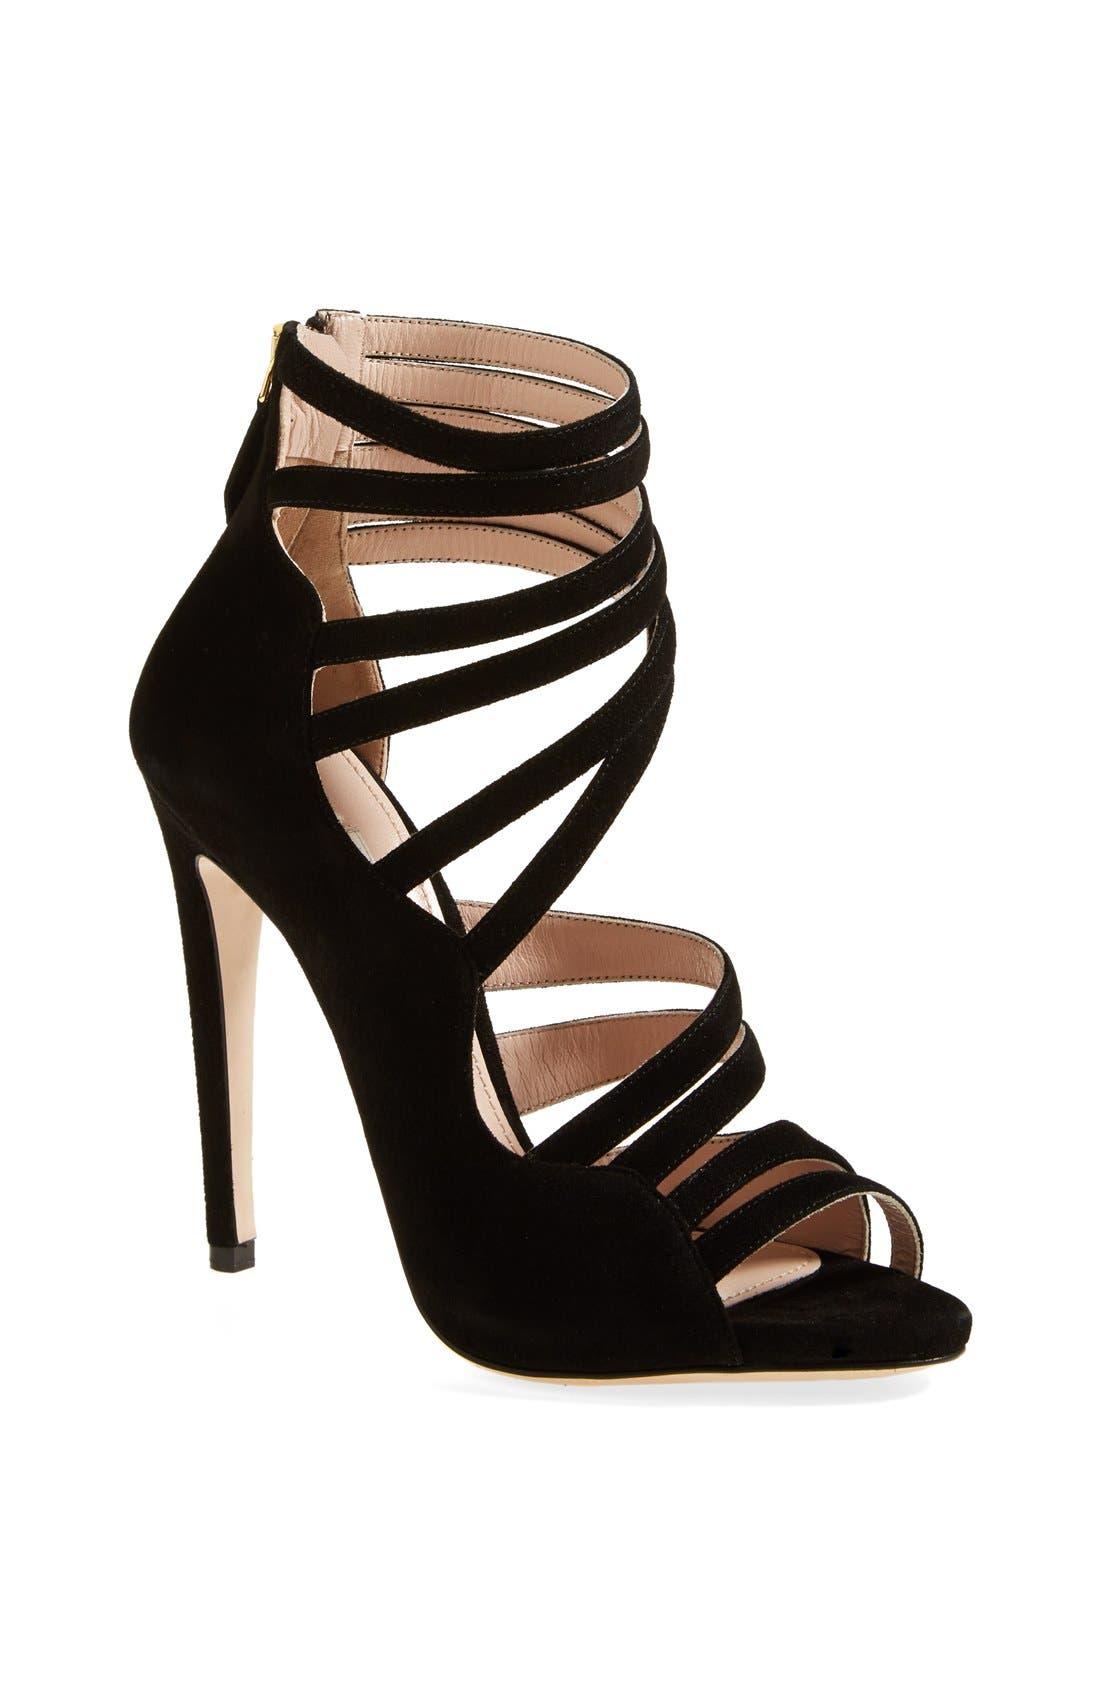 MIU MIU Asymmetrical Strappy Sandal, Main, color, 001